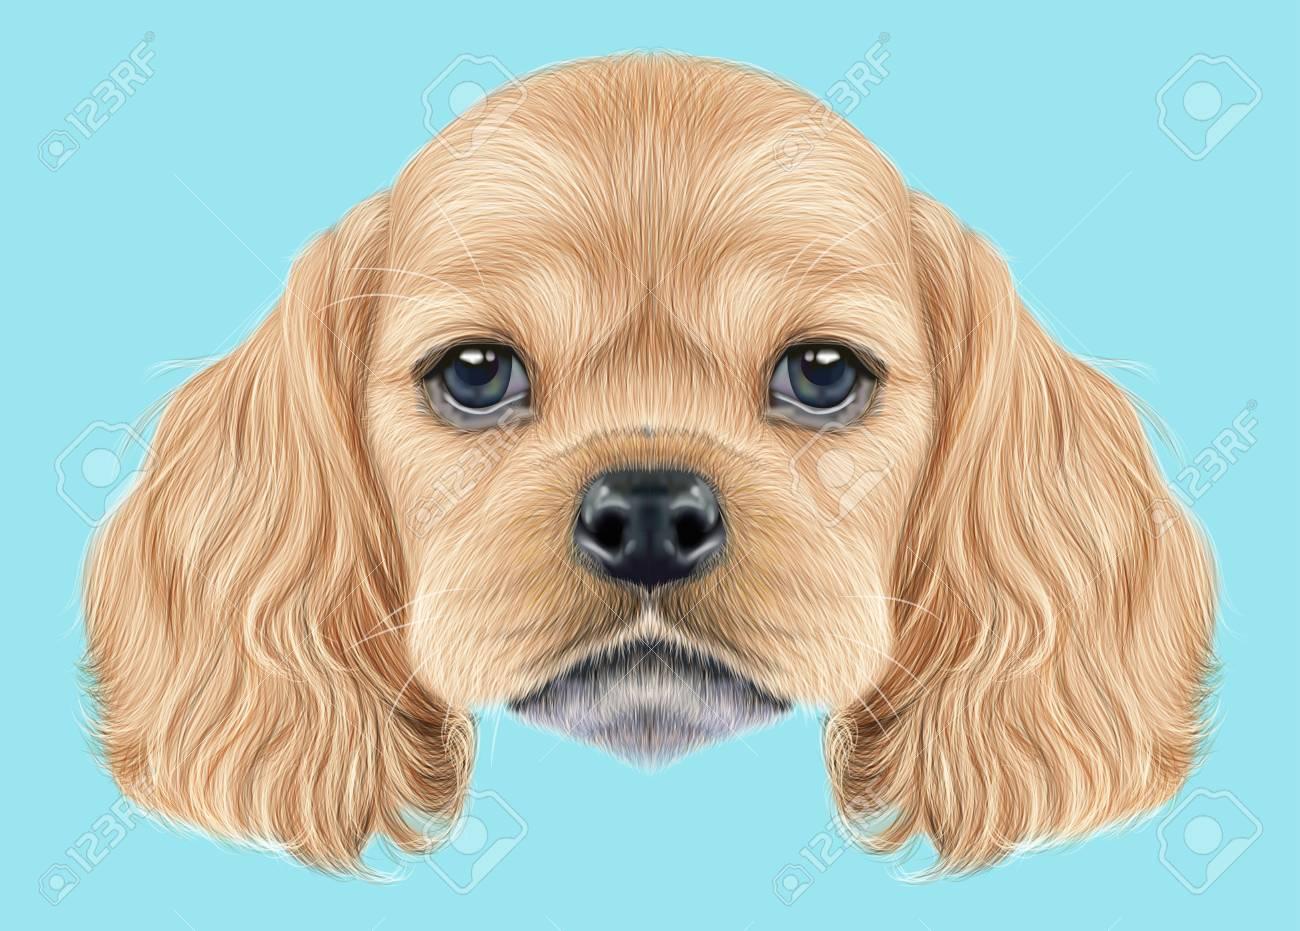 illustrated portrait of american cocker spaniel puppy cute fluffy